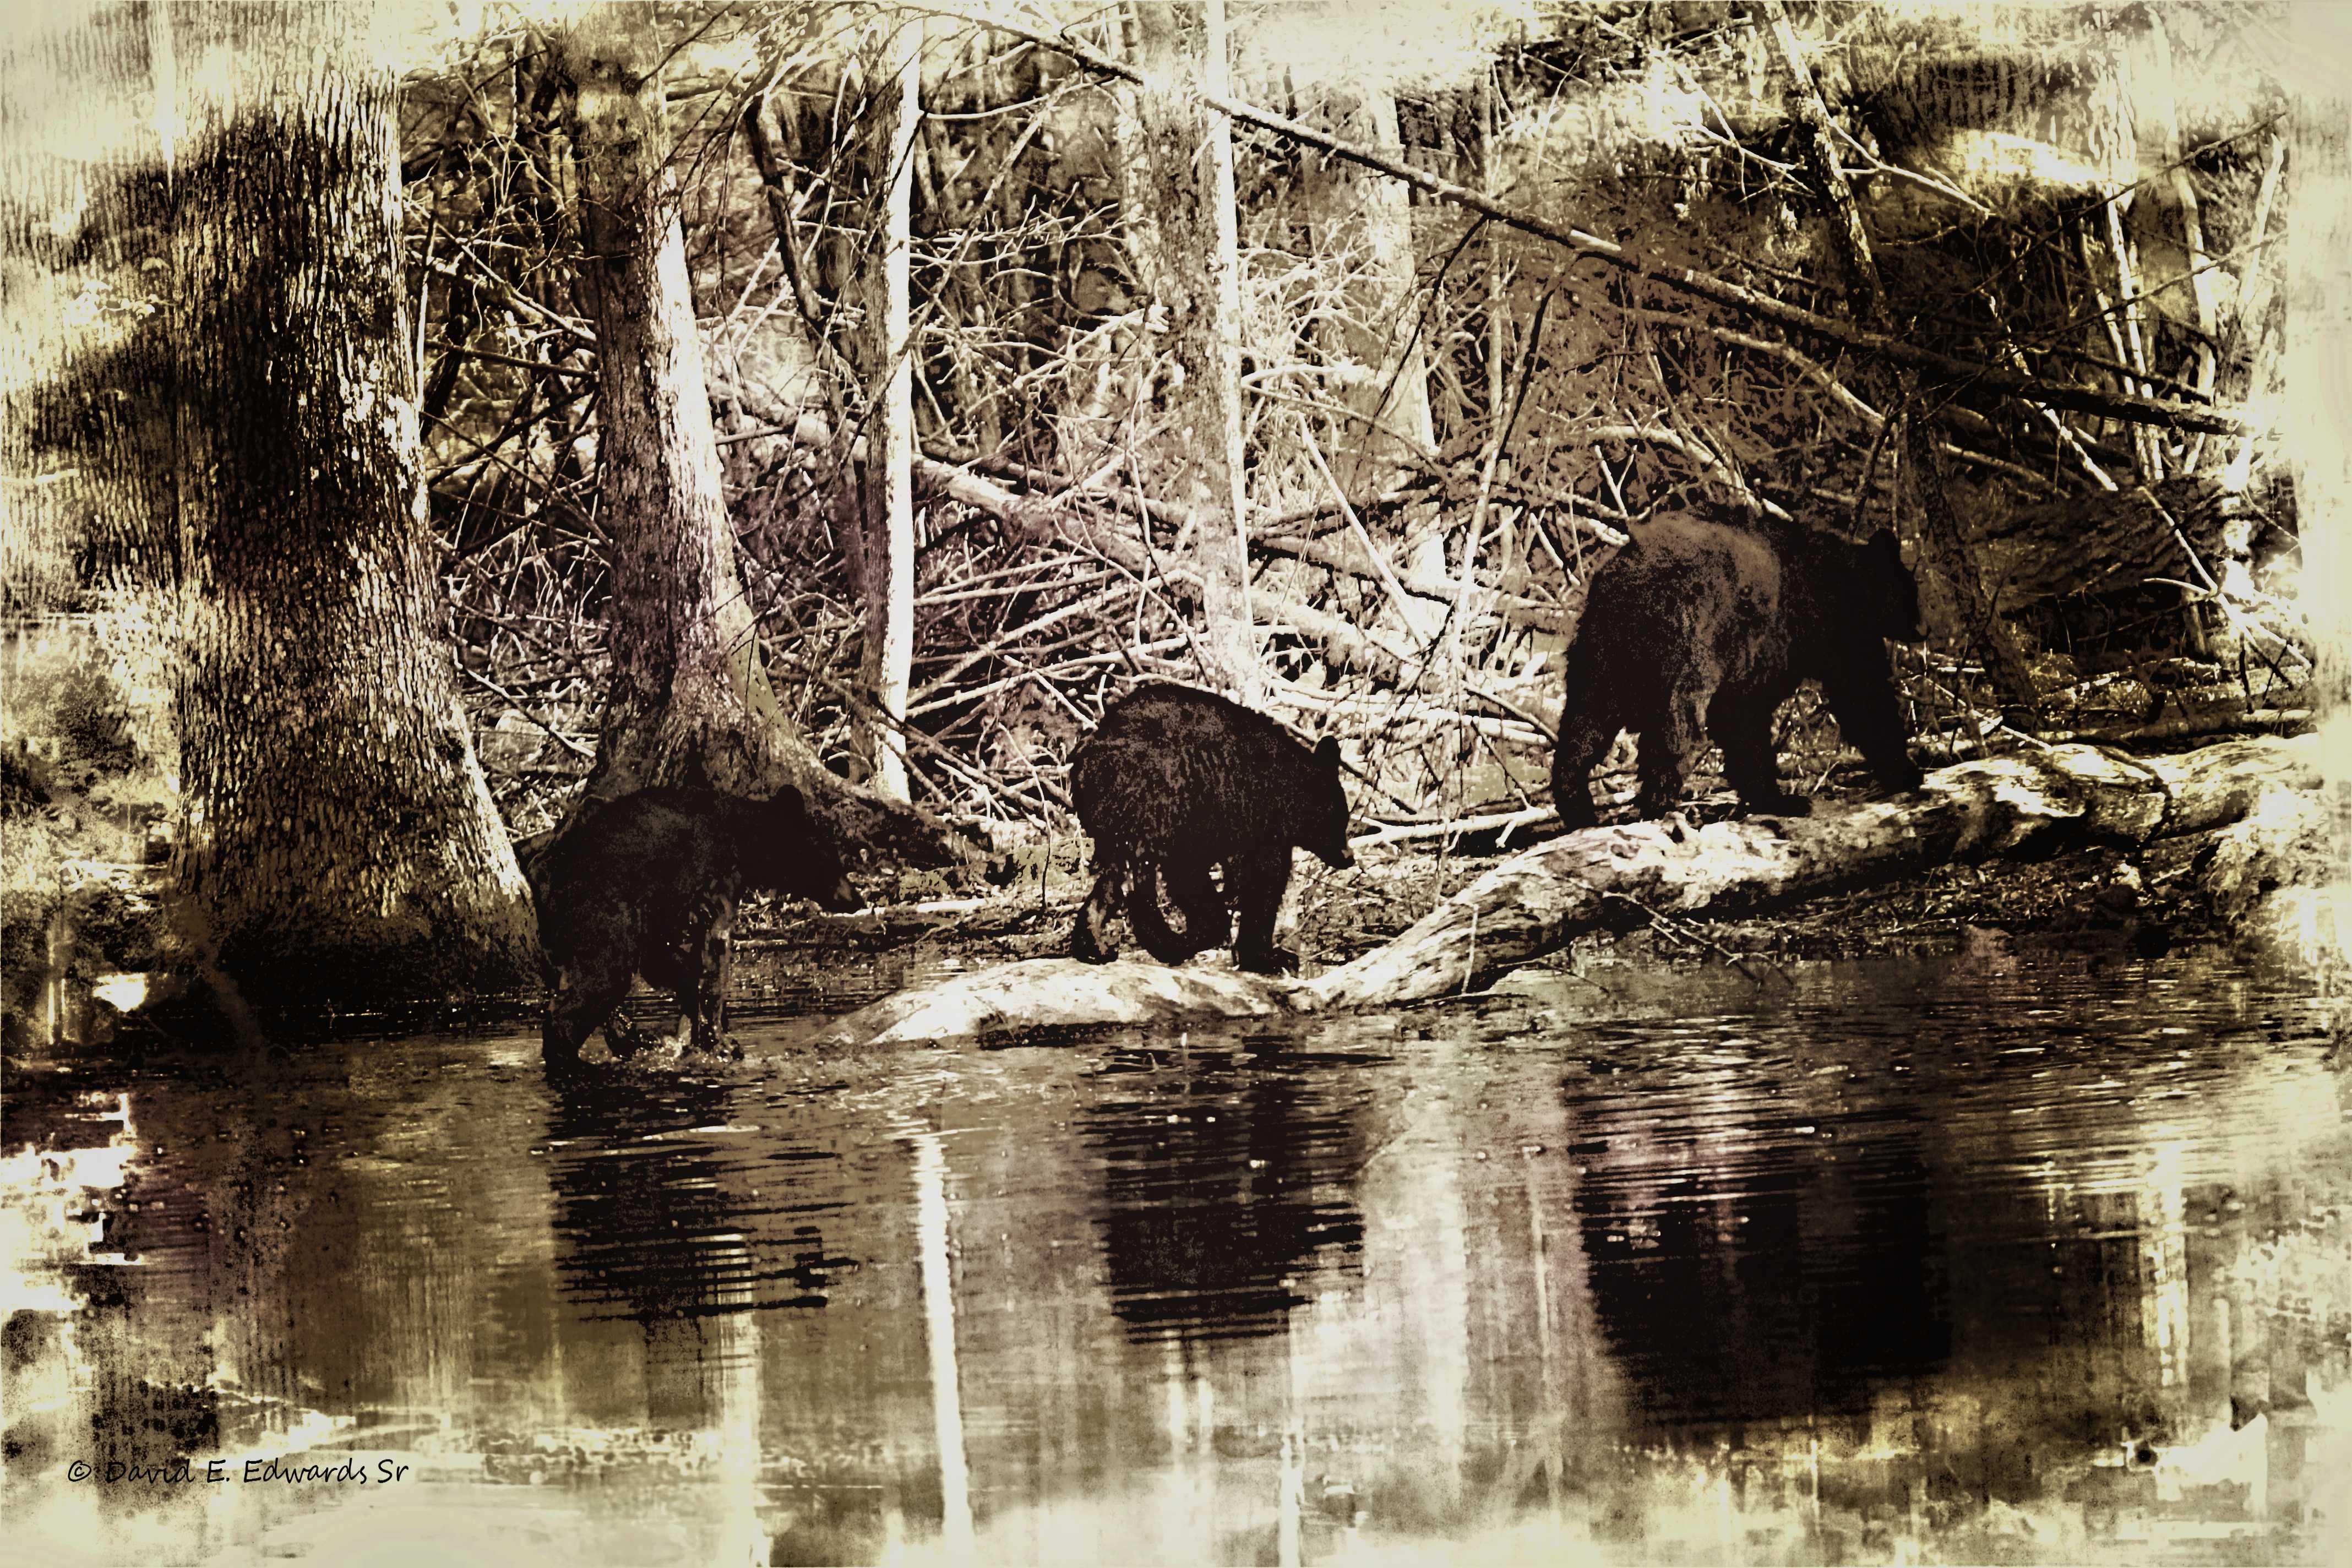 3 Bears old style photo edit